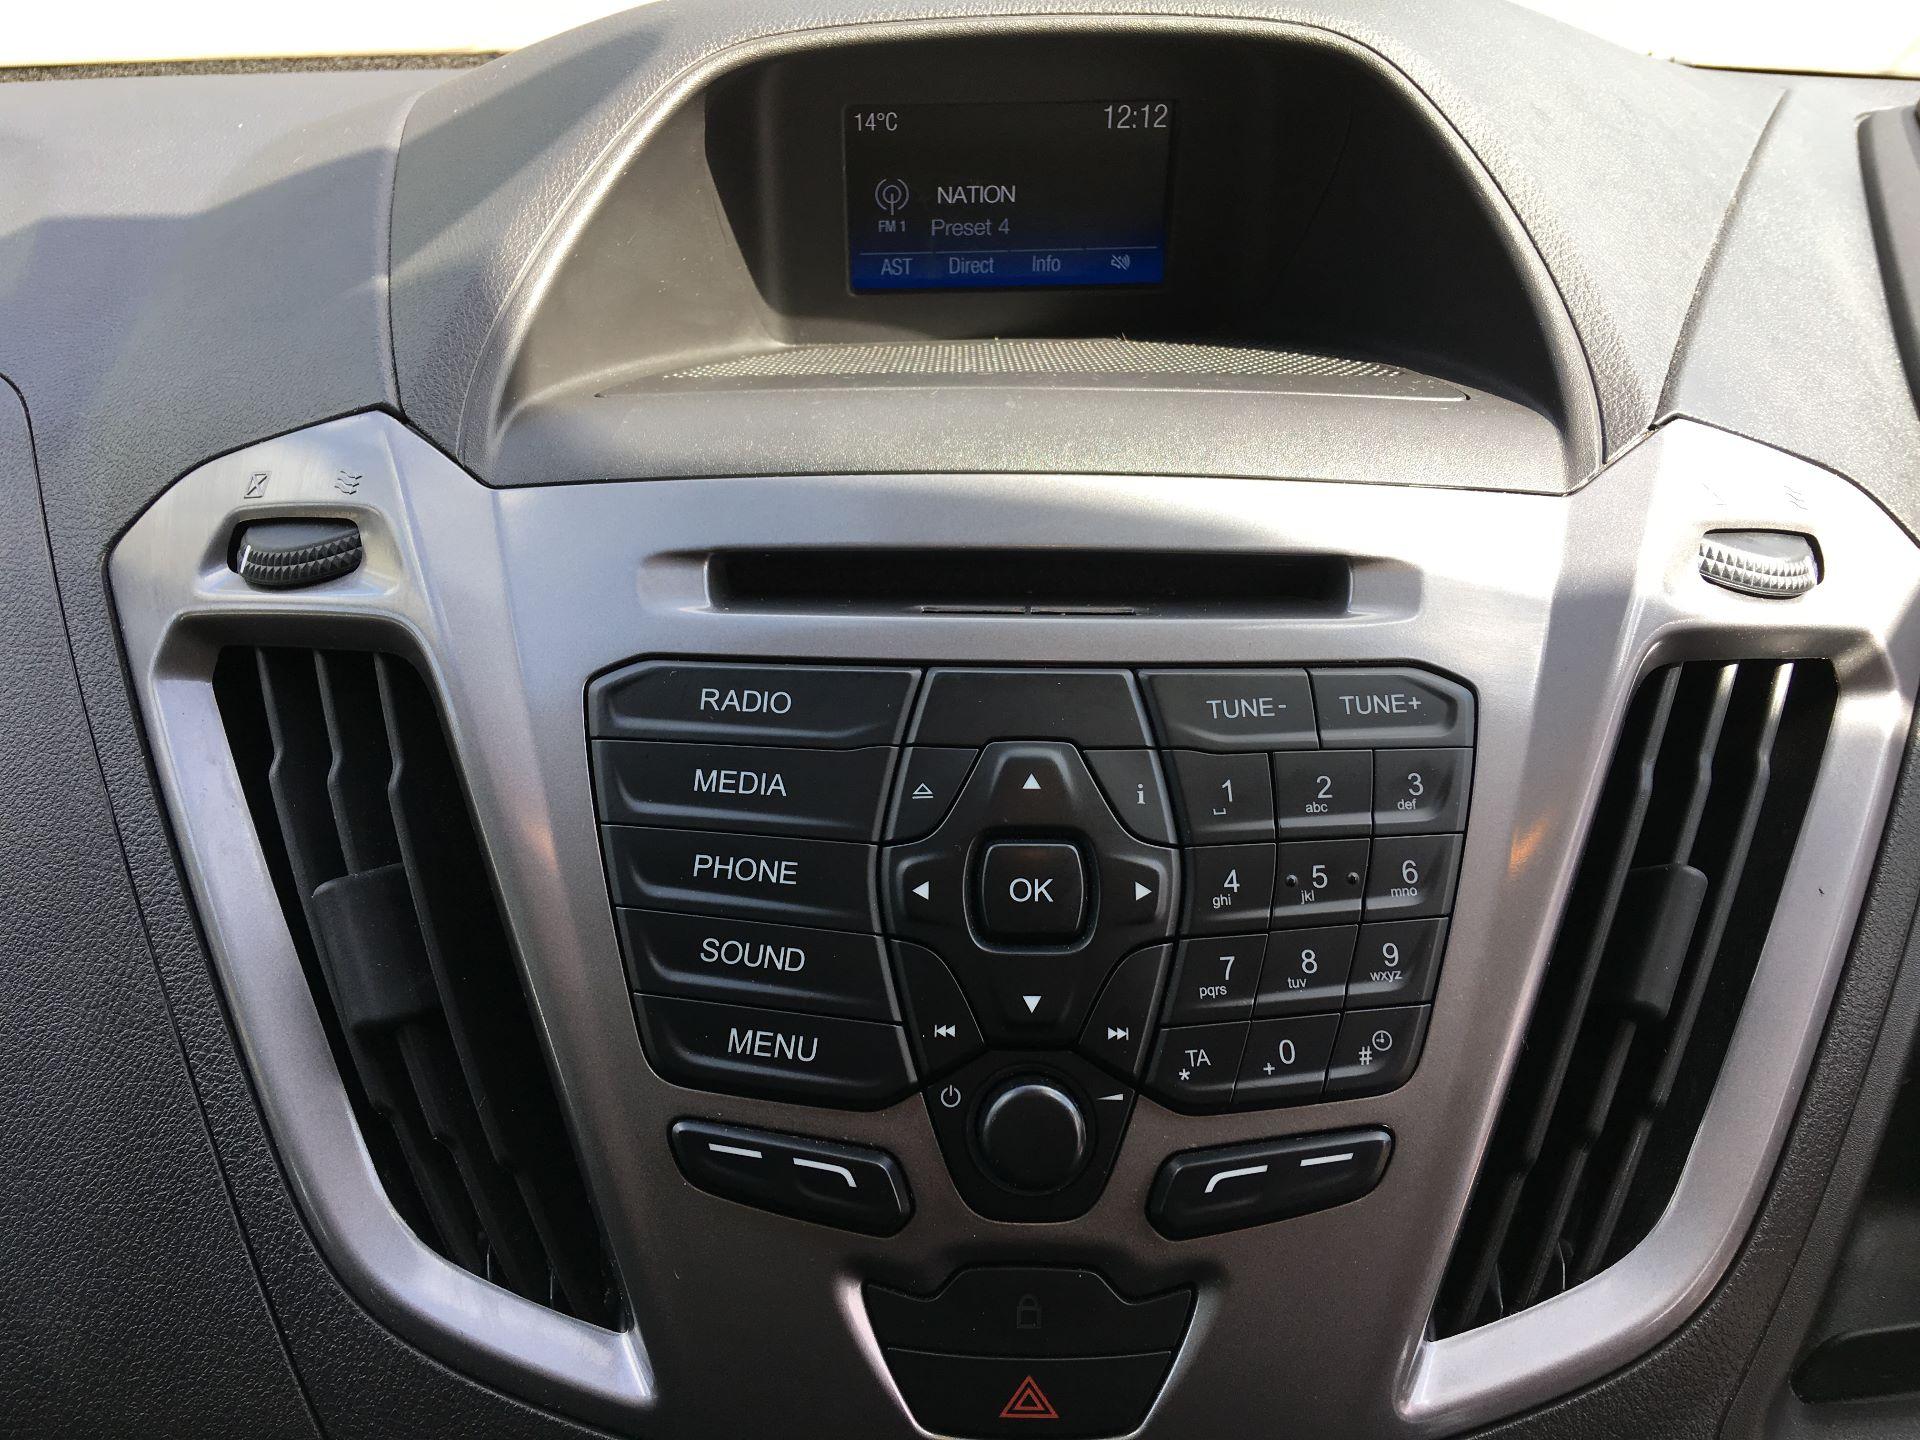 2018 Ford Transit Custom 290 L1 DIESEL FWD 2.0 TDCI 105PS LOW ROOF TREND EURO 6 (SH67VDK) Image 3